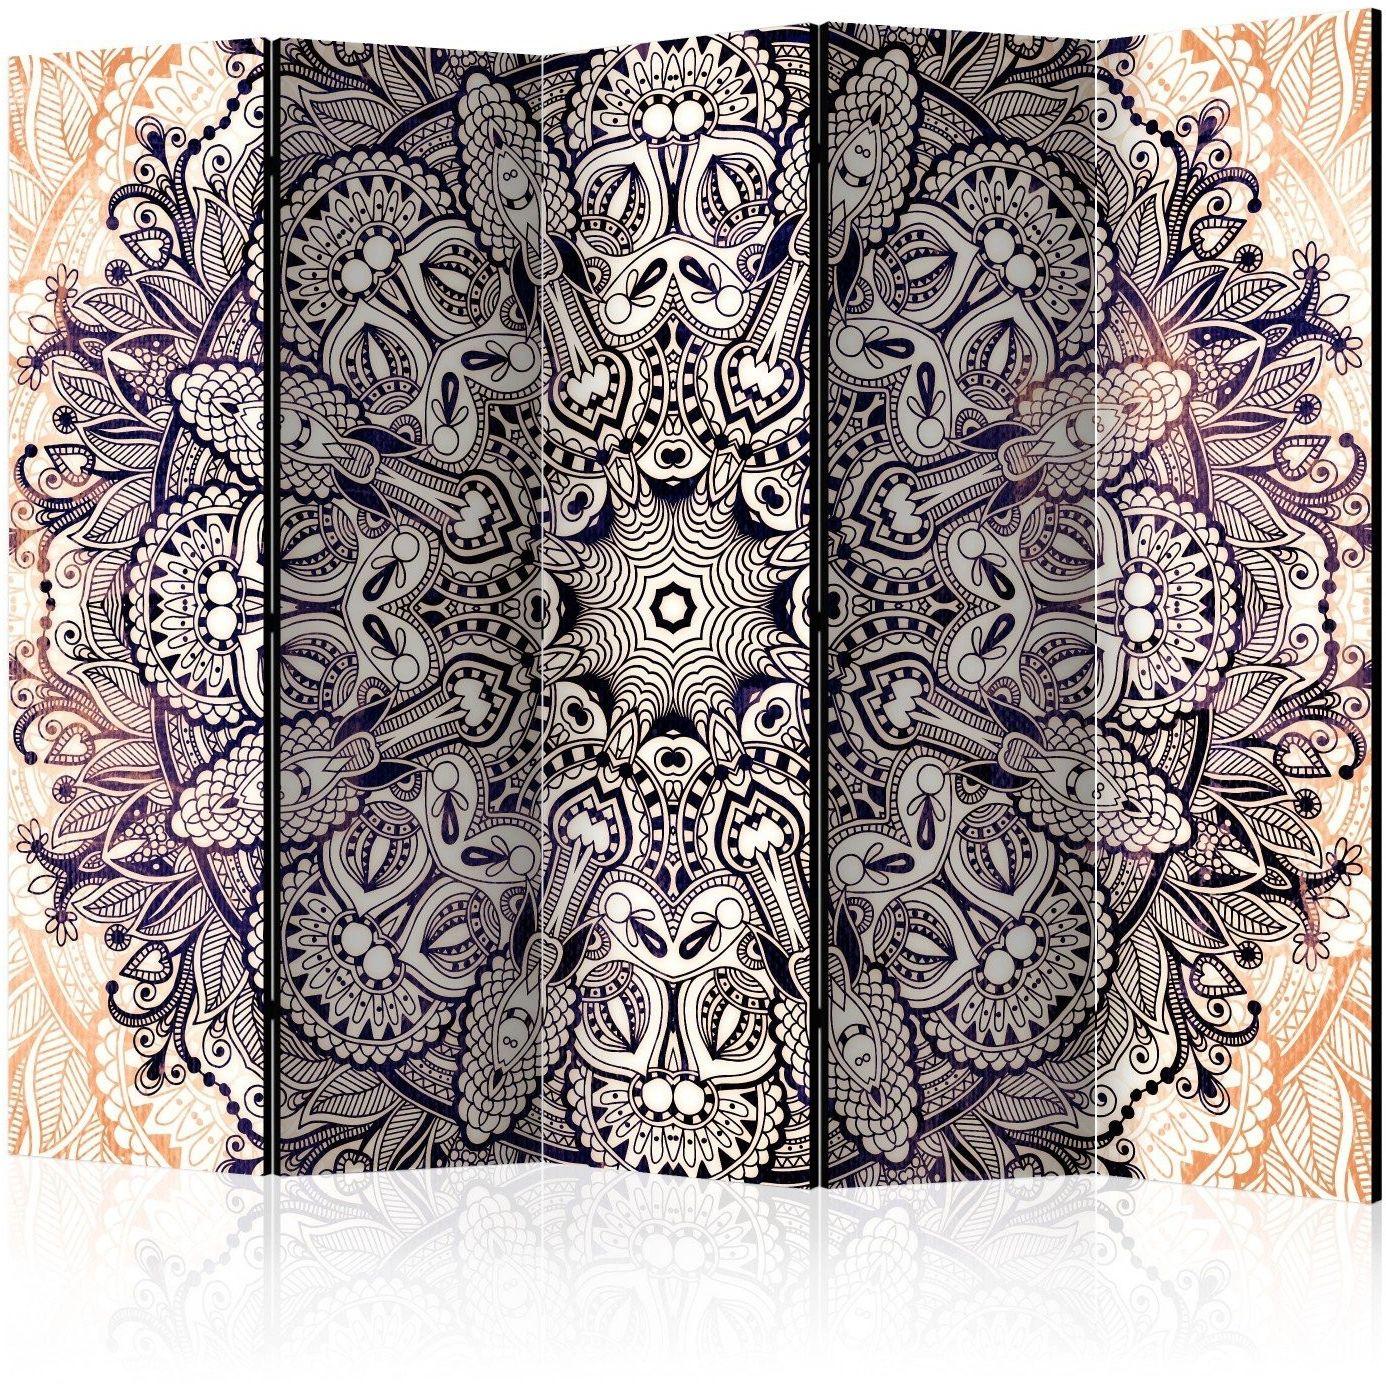 Parawan 5-częściowy - orientalny kunszt ii [room dividers]